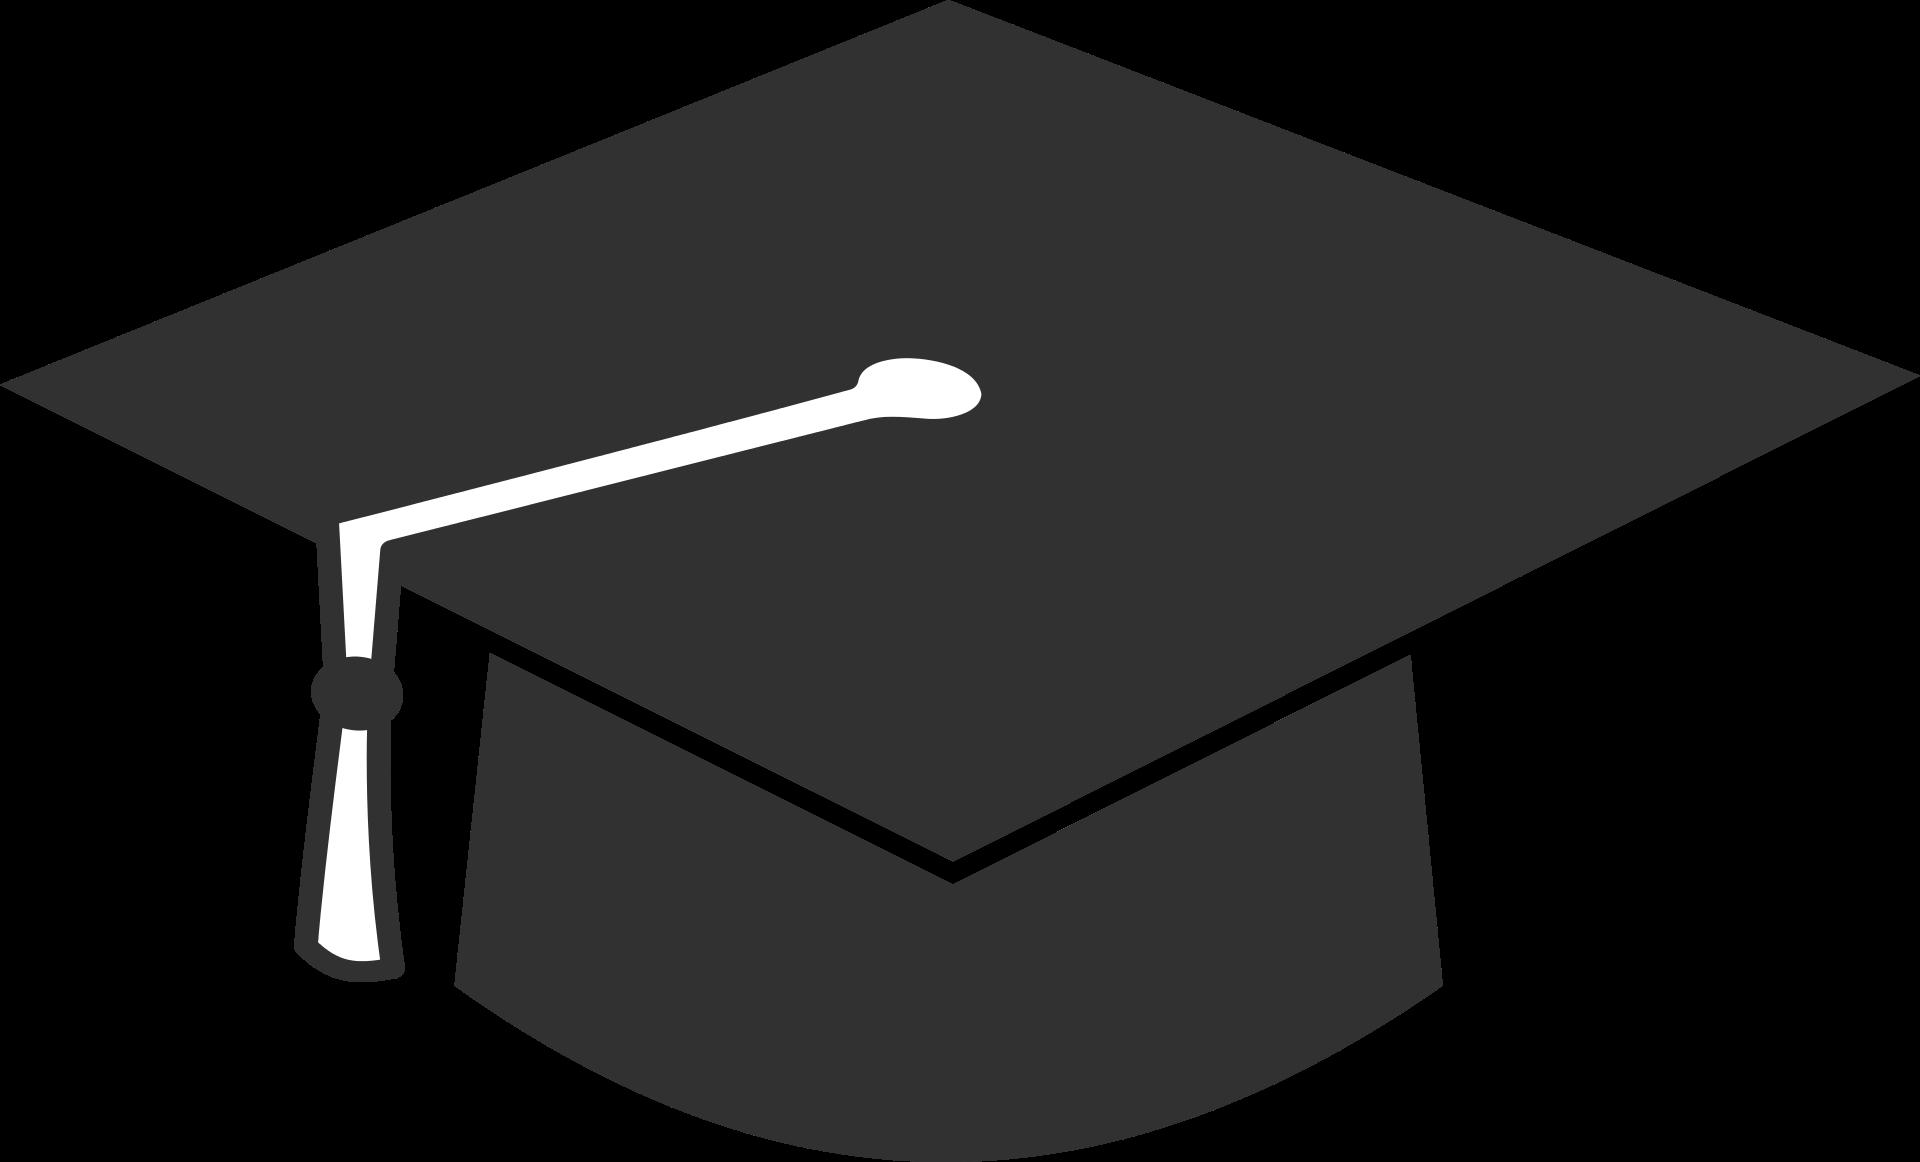 pixabay-cap-1266204